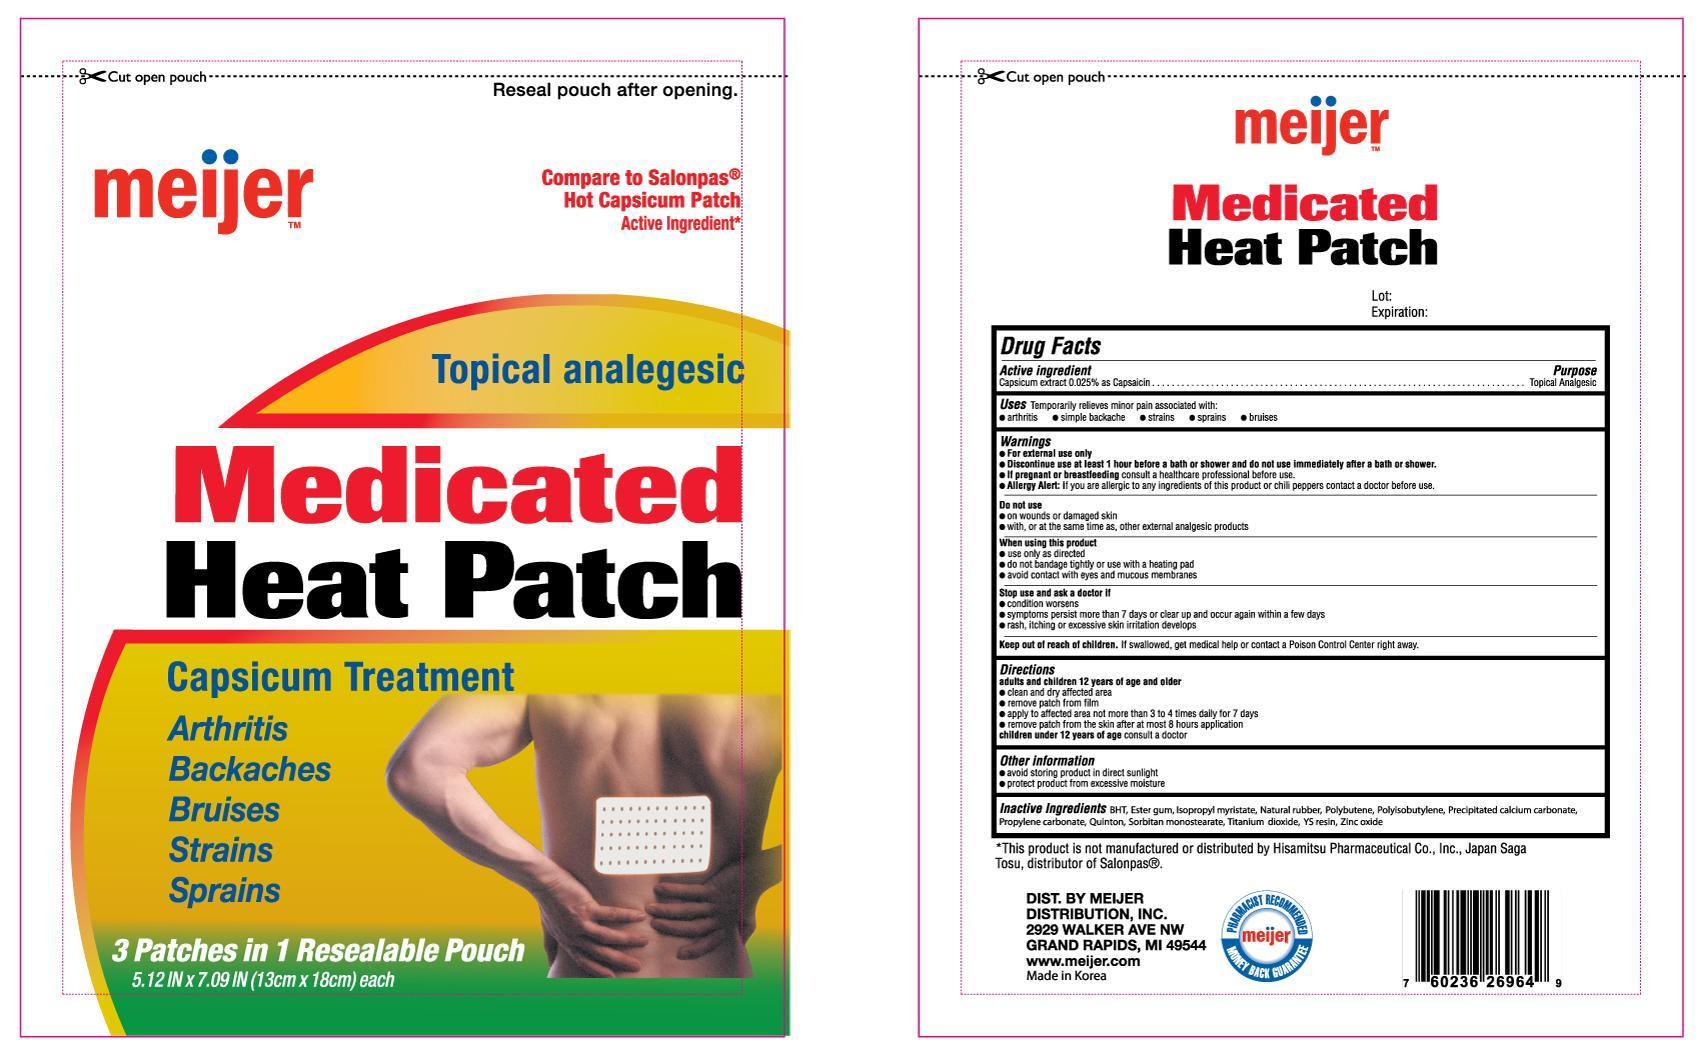 Meijer Medicated Heat (Capsaicin) Patch [Meijer]